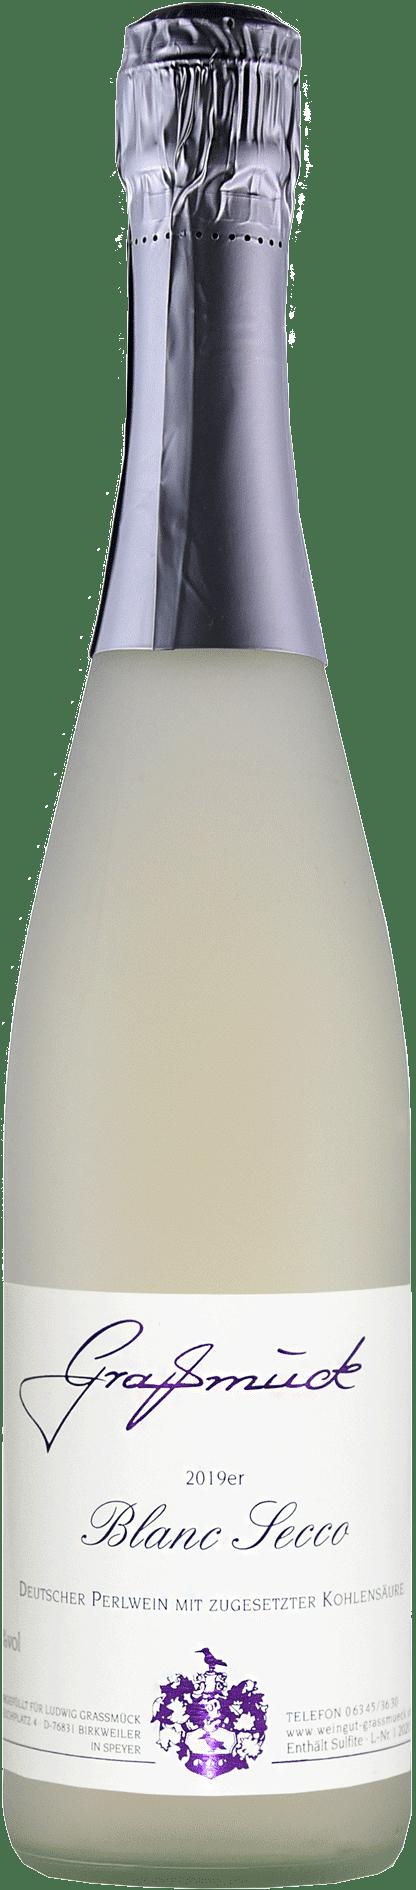 Weingut Ludwig Graßmück, Simon Graßmück, Blanc Secco 2019